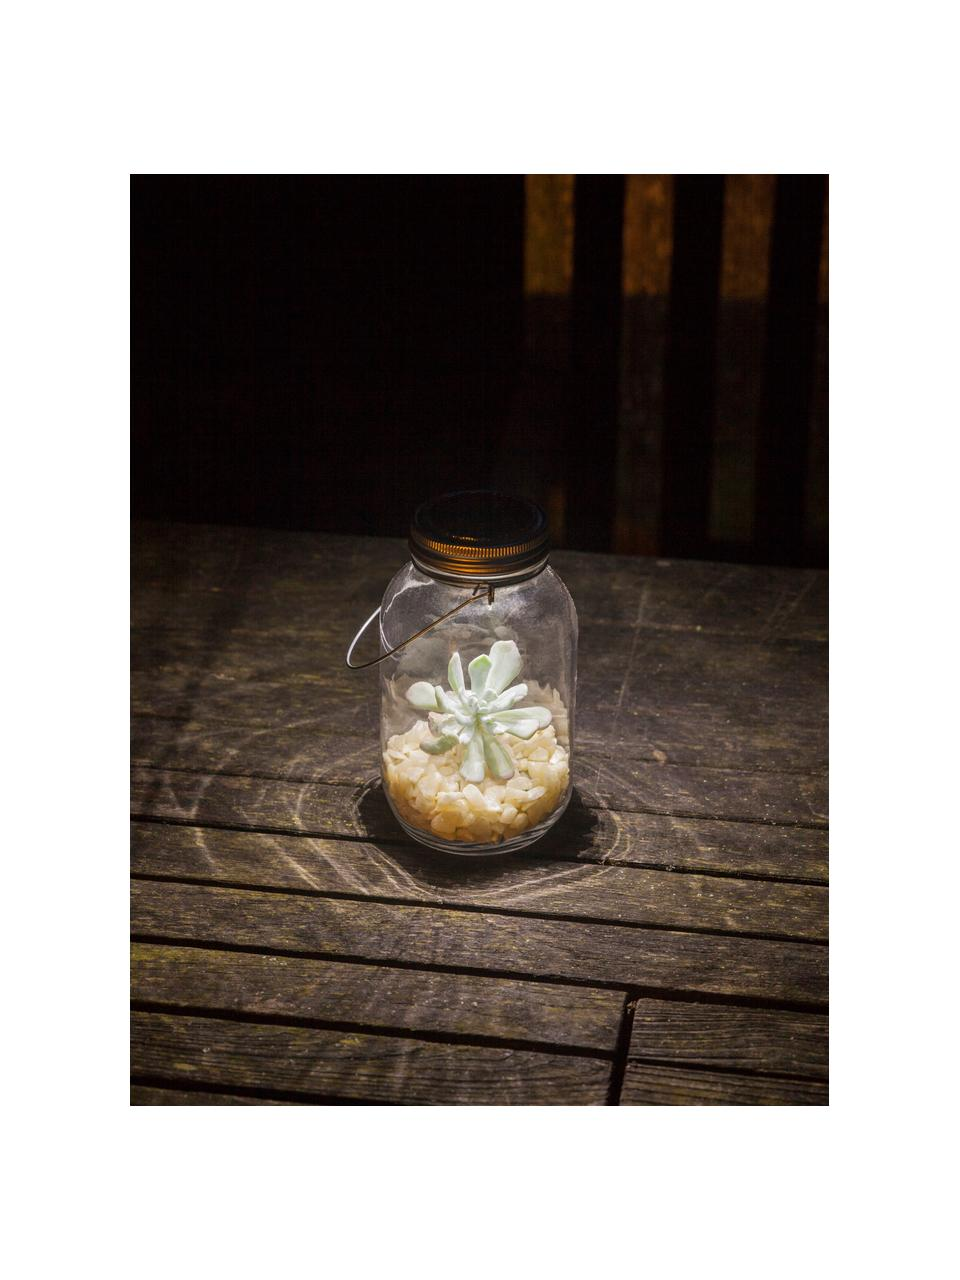 Lanterna solare da esterno Bianca, Paralume: vetro, Coperchio: metallo zincato, Manico: metallo zincato, Trasparente, Ø 10 x Alt. 18 cm